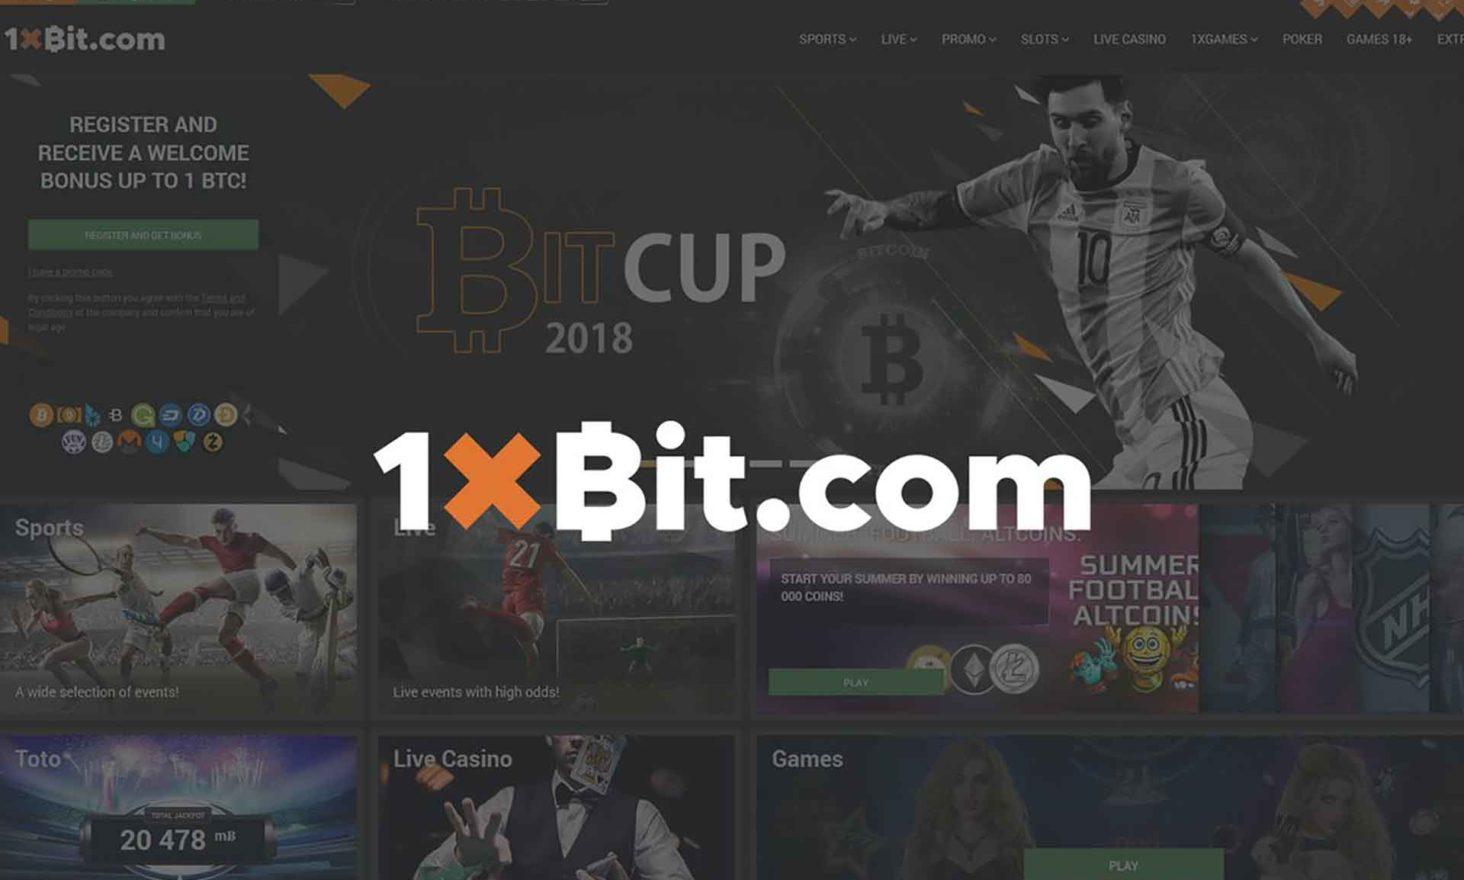 1xBit Launches World Cup Promotion